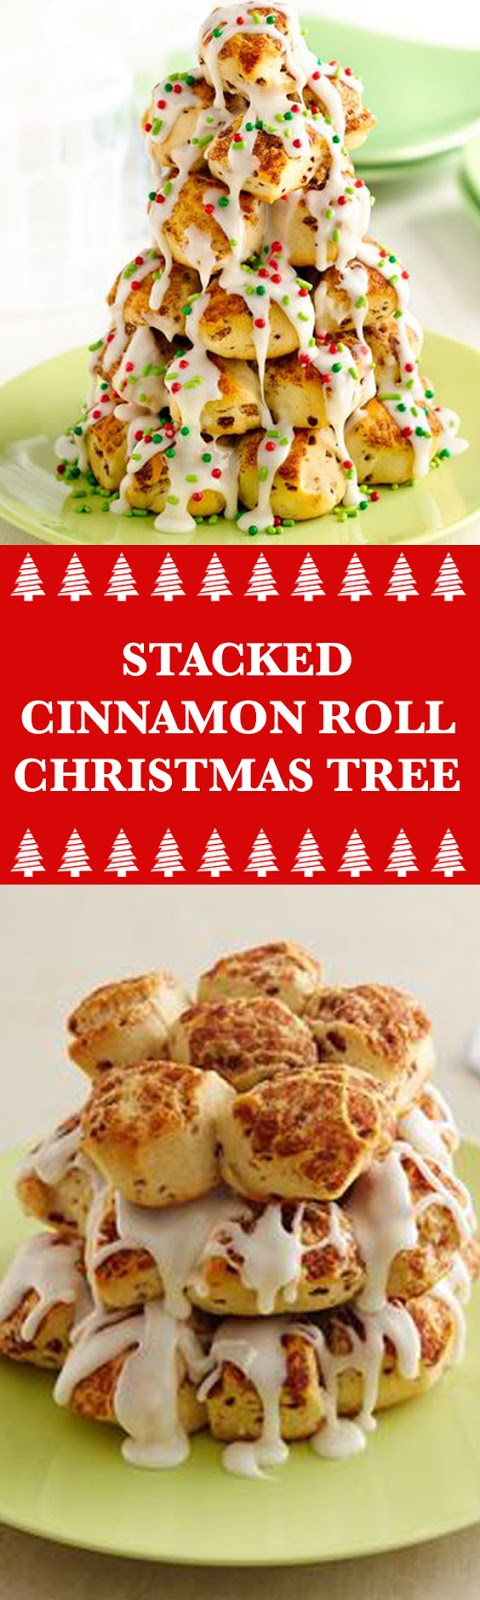 Stacked Cinnamon Roll Christmas Tree